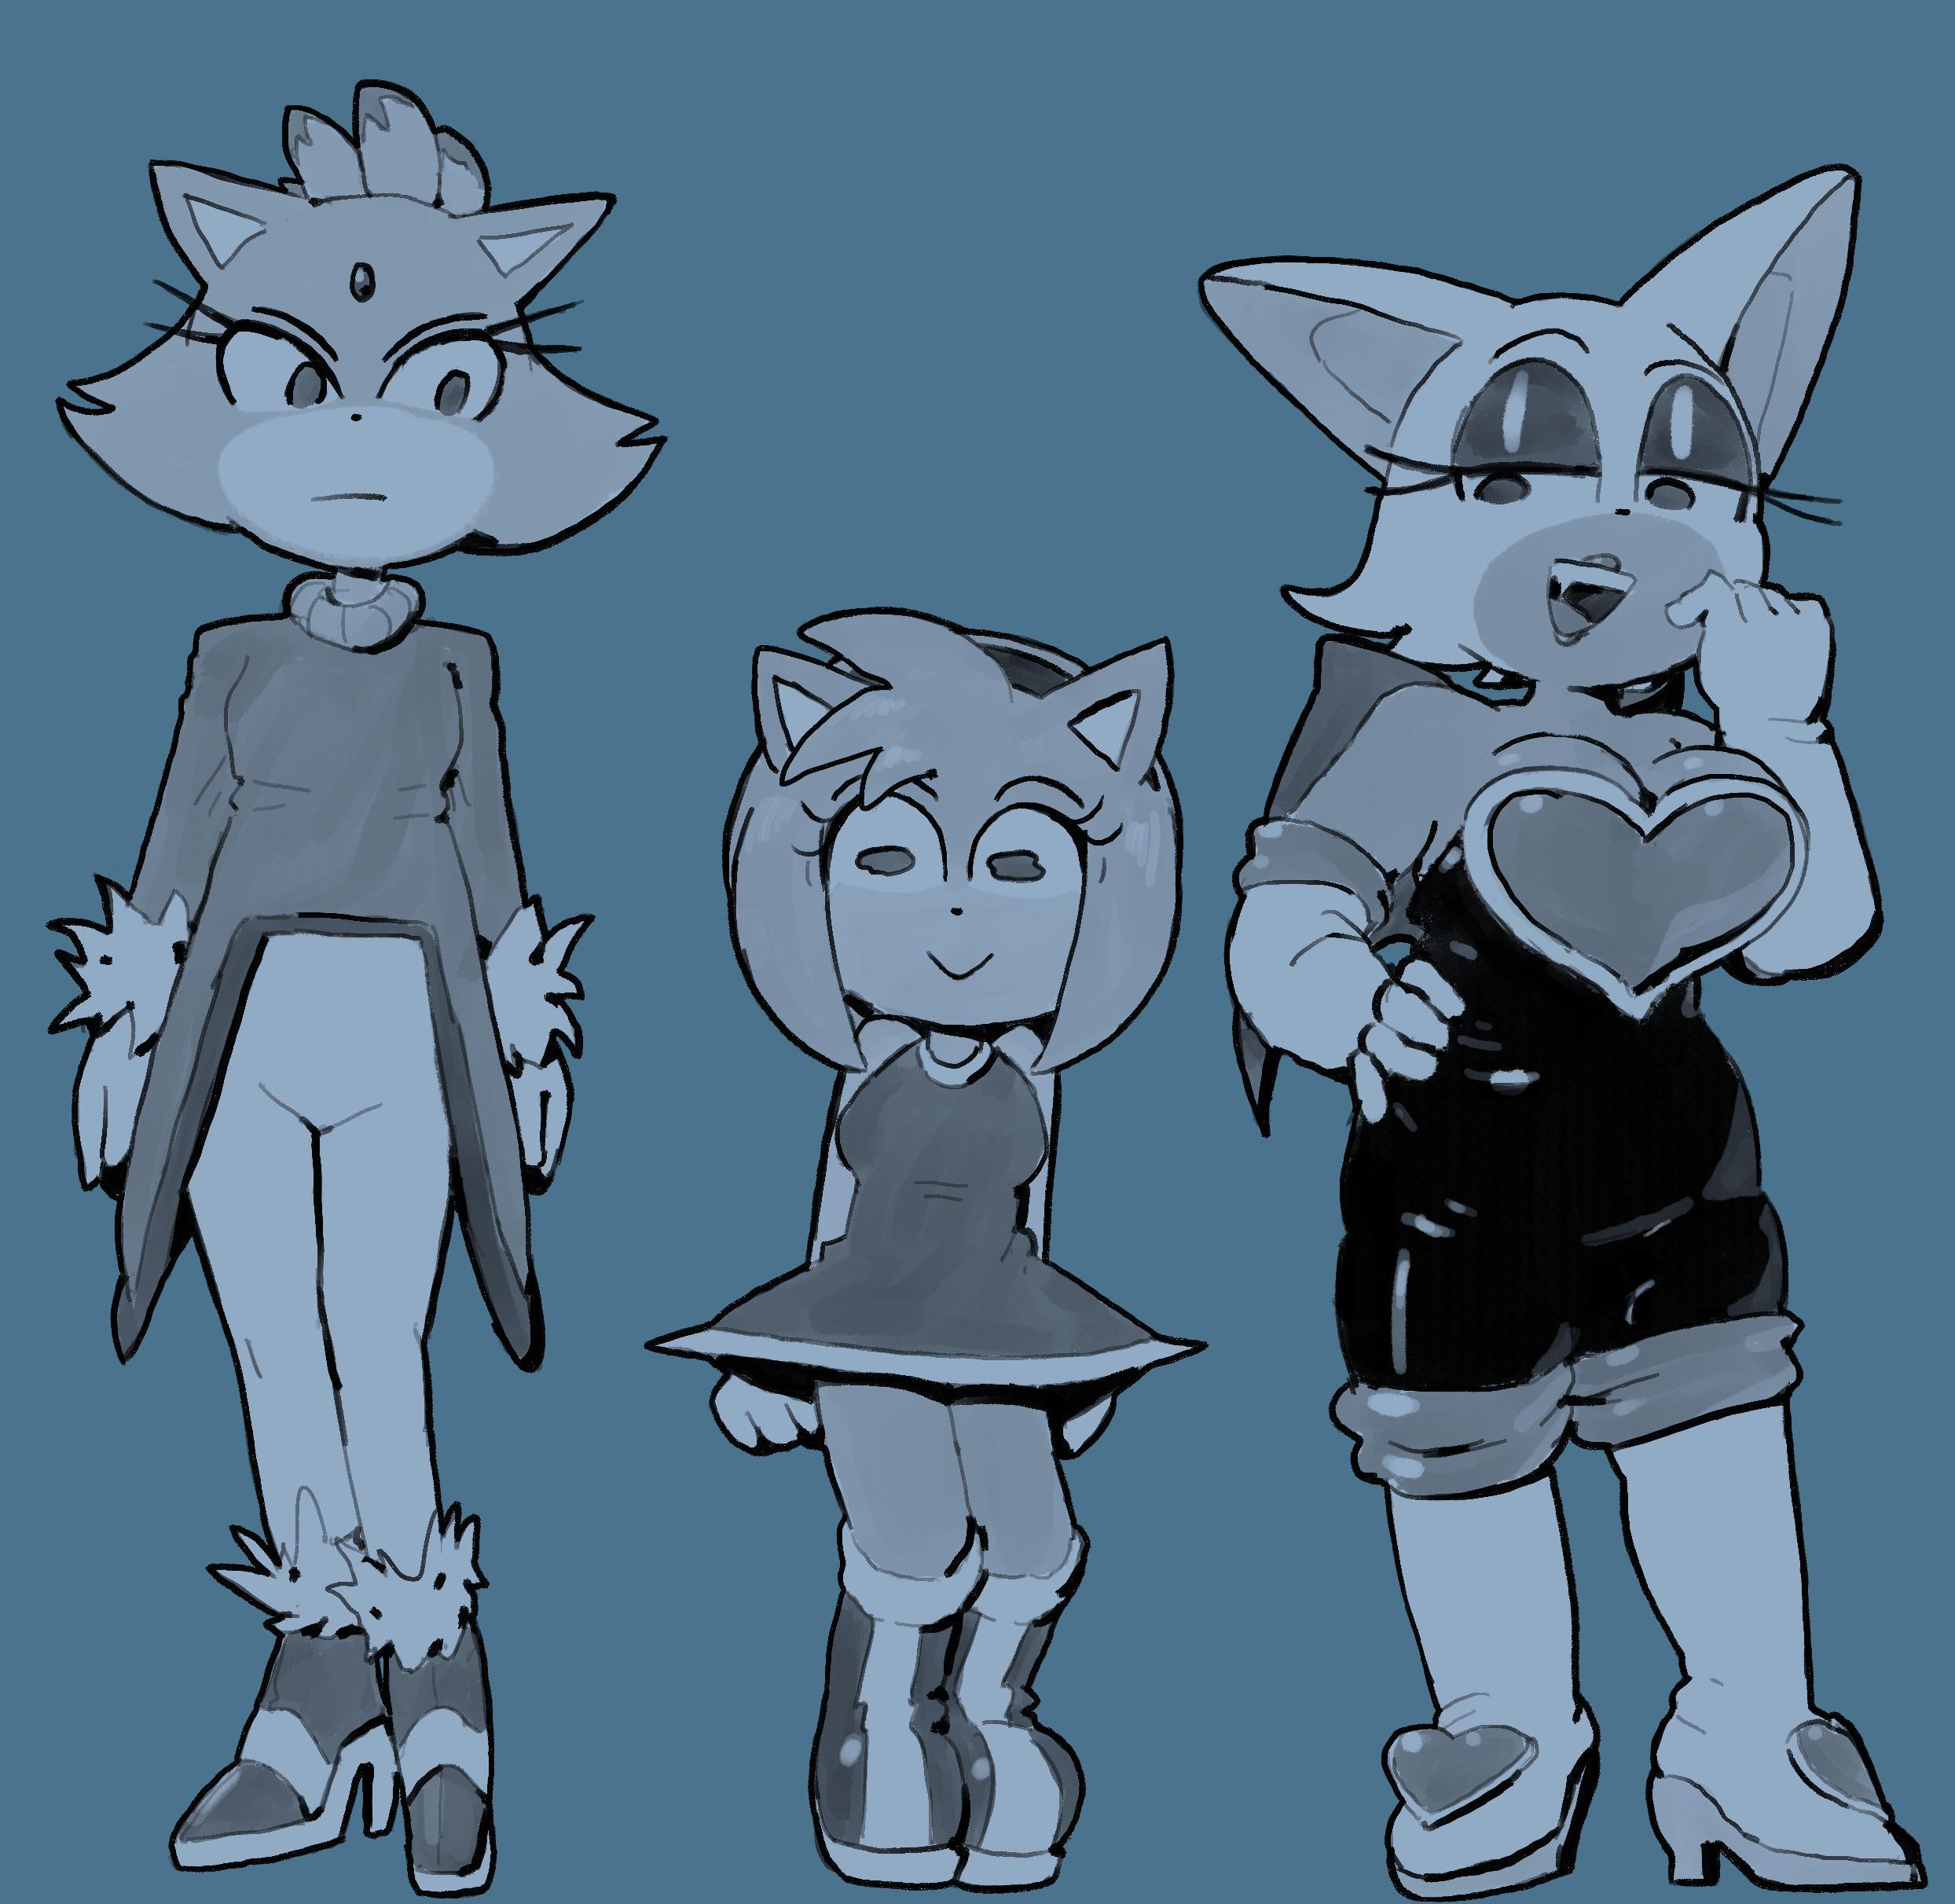 Short hog